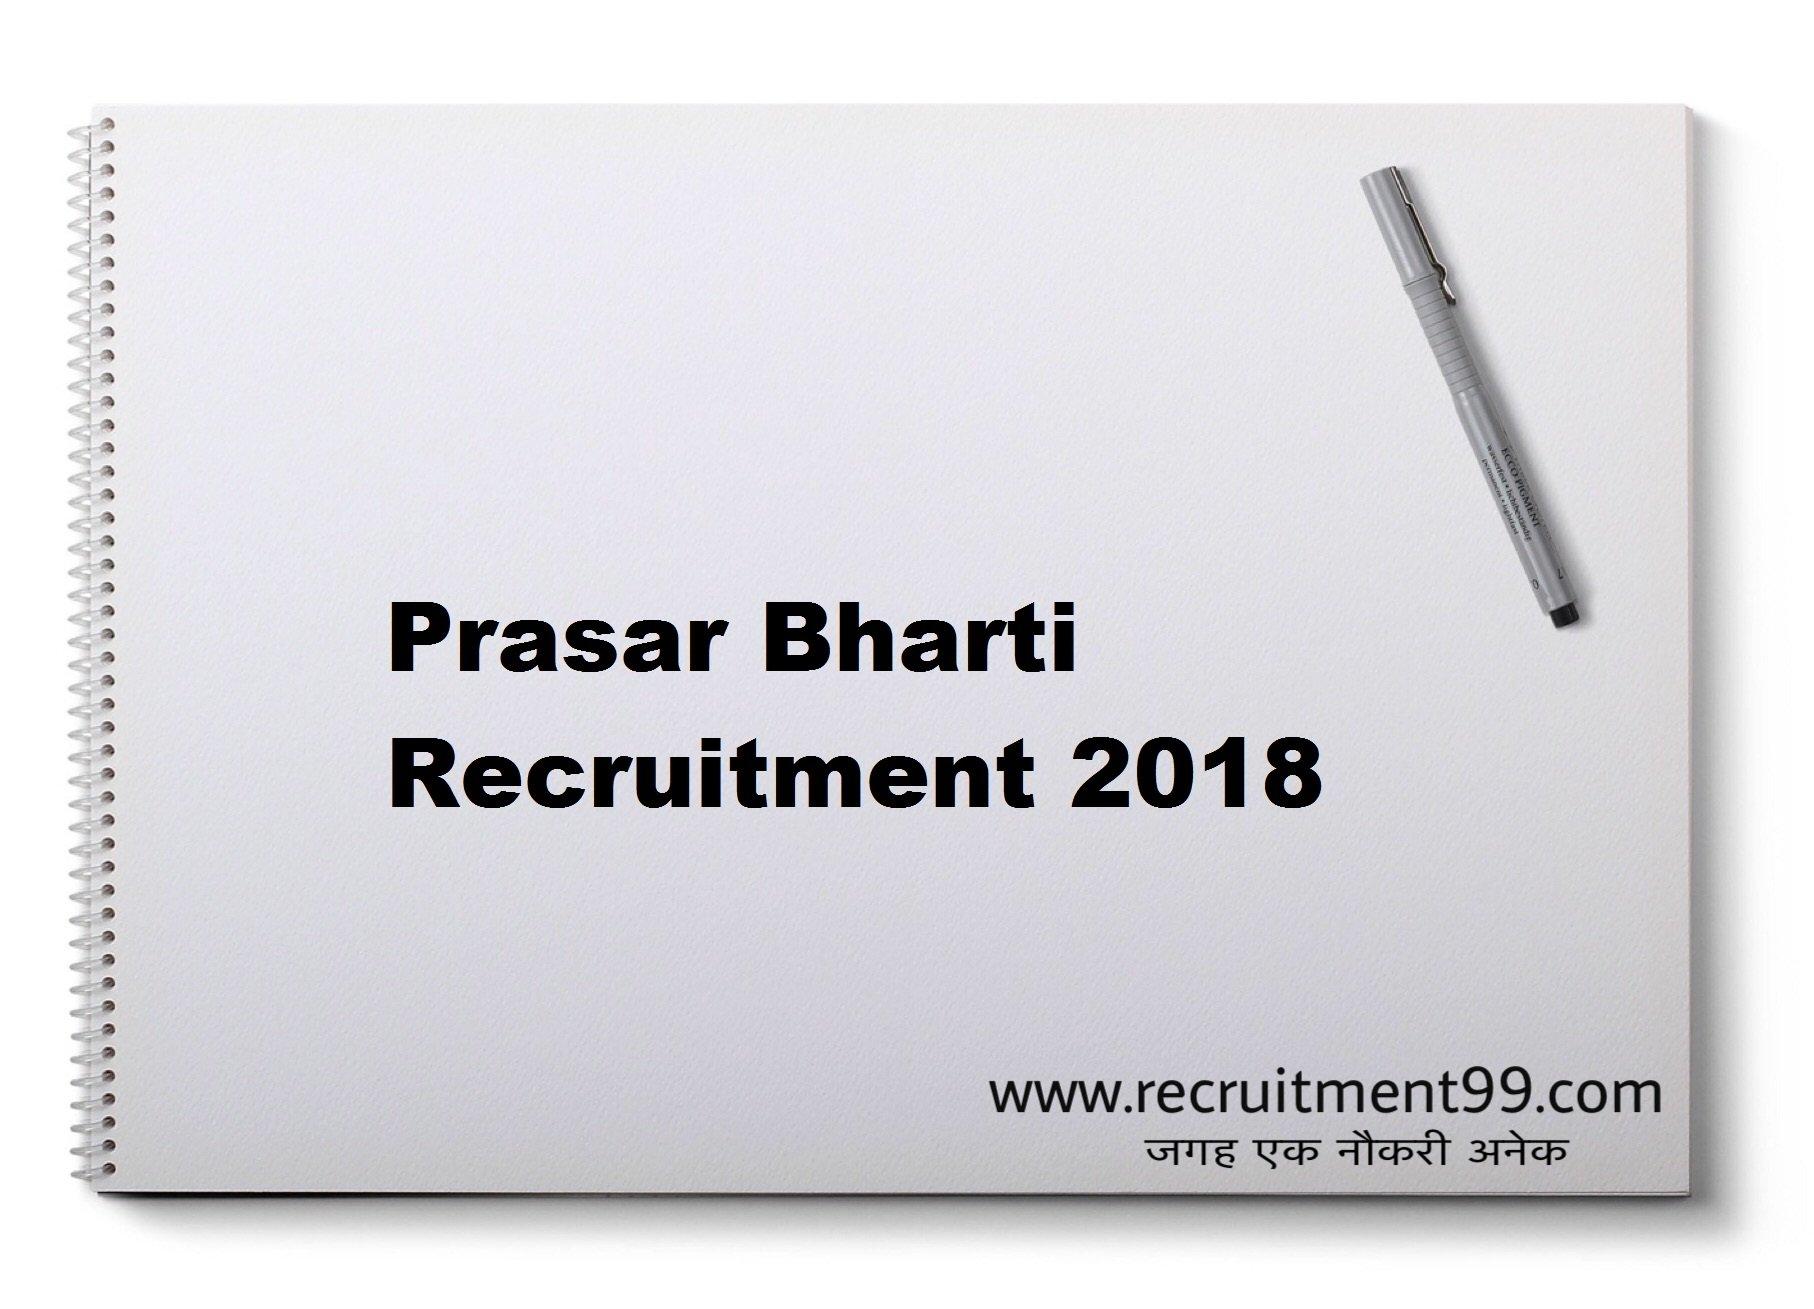 Prasar Bharti News Editor /Reader, DEO Recruitment Admit Card & Result 2018